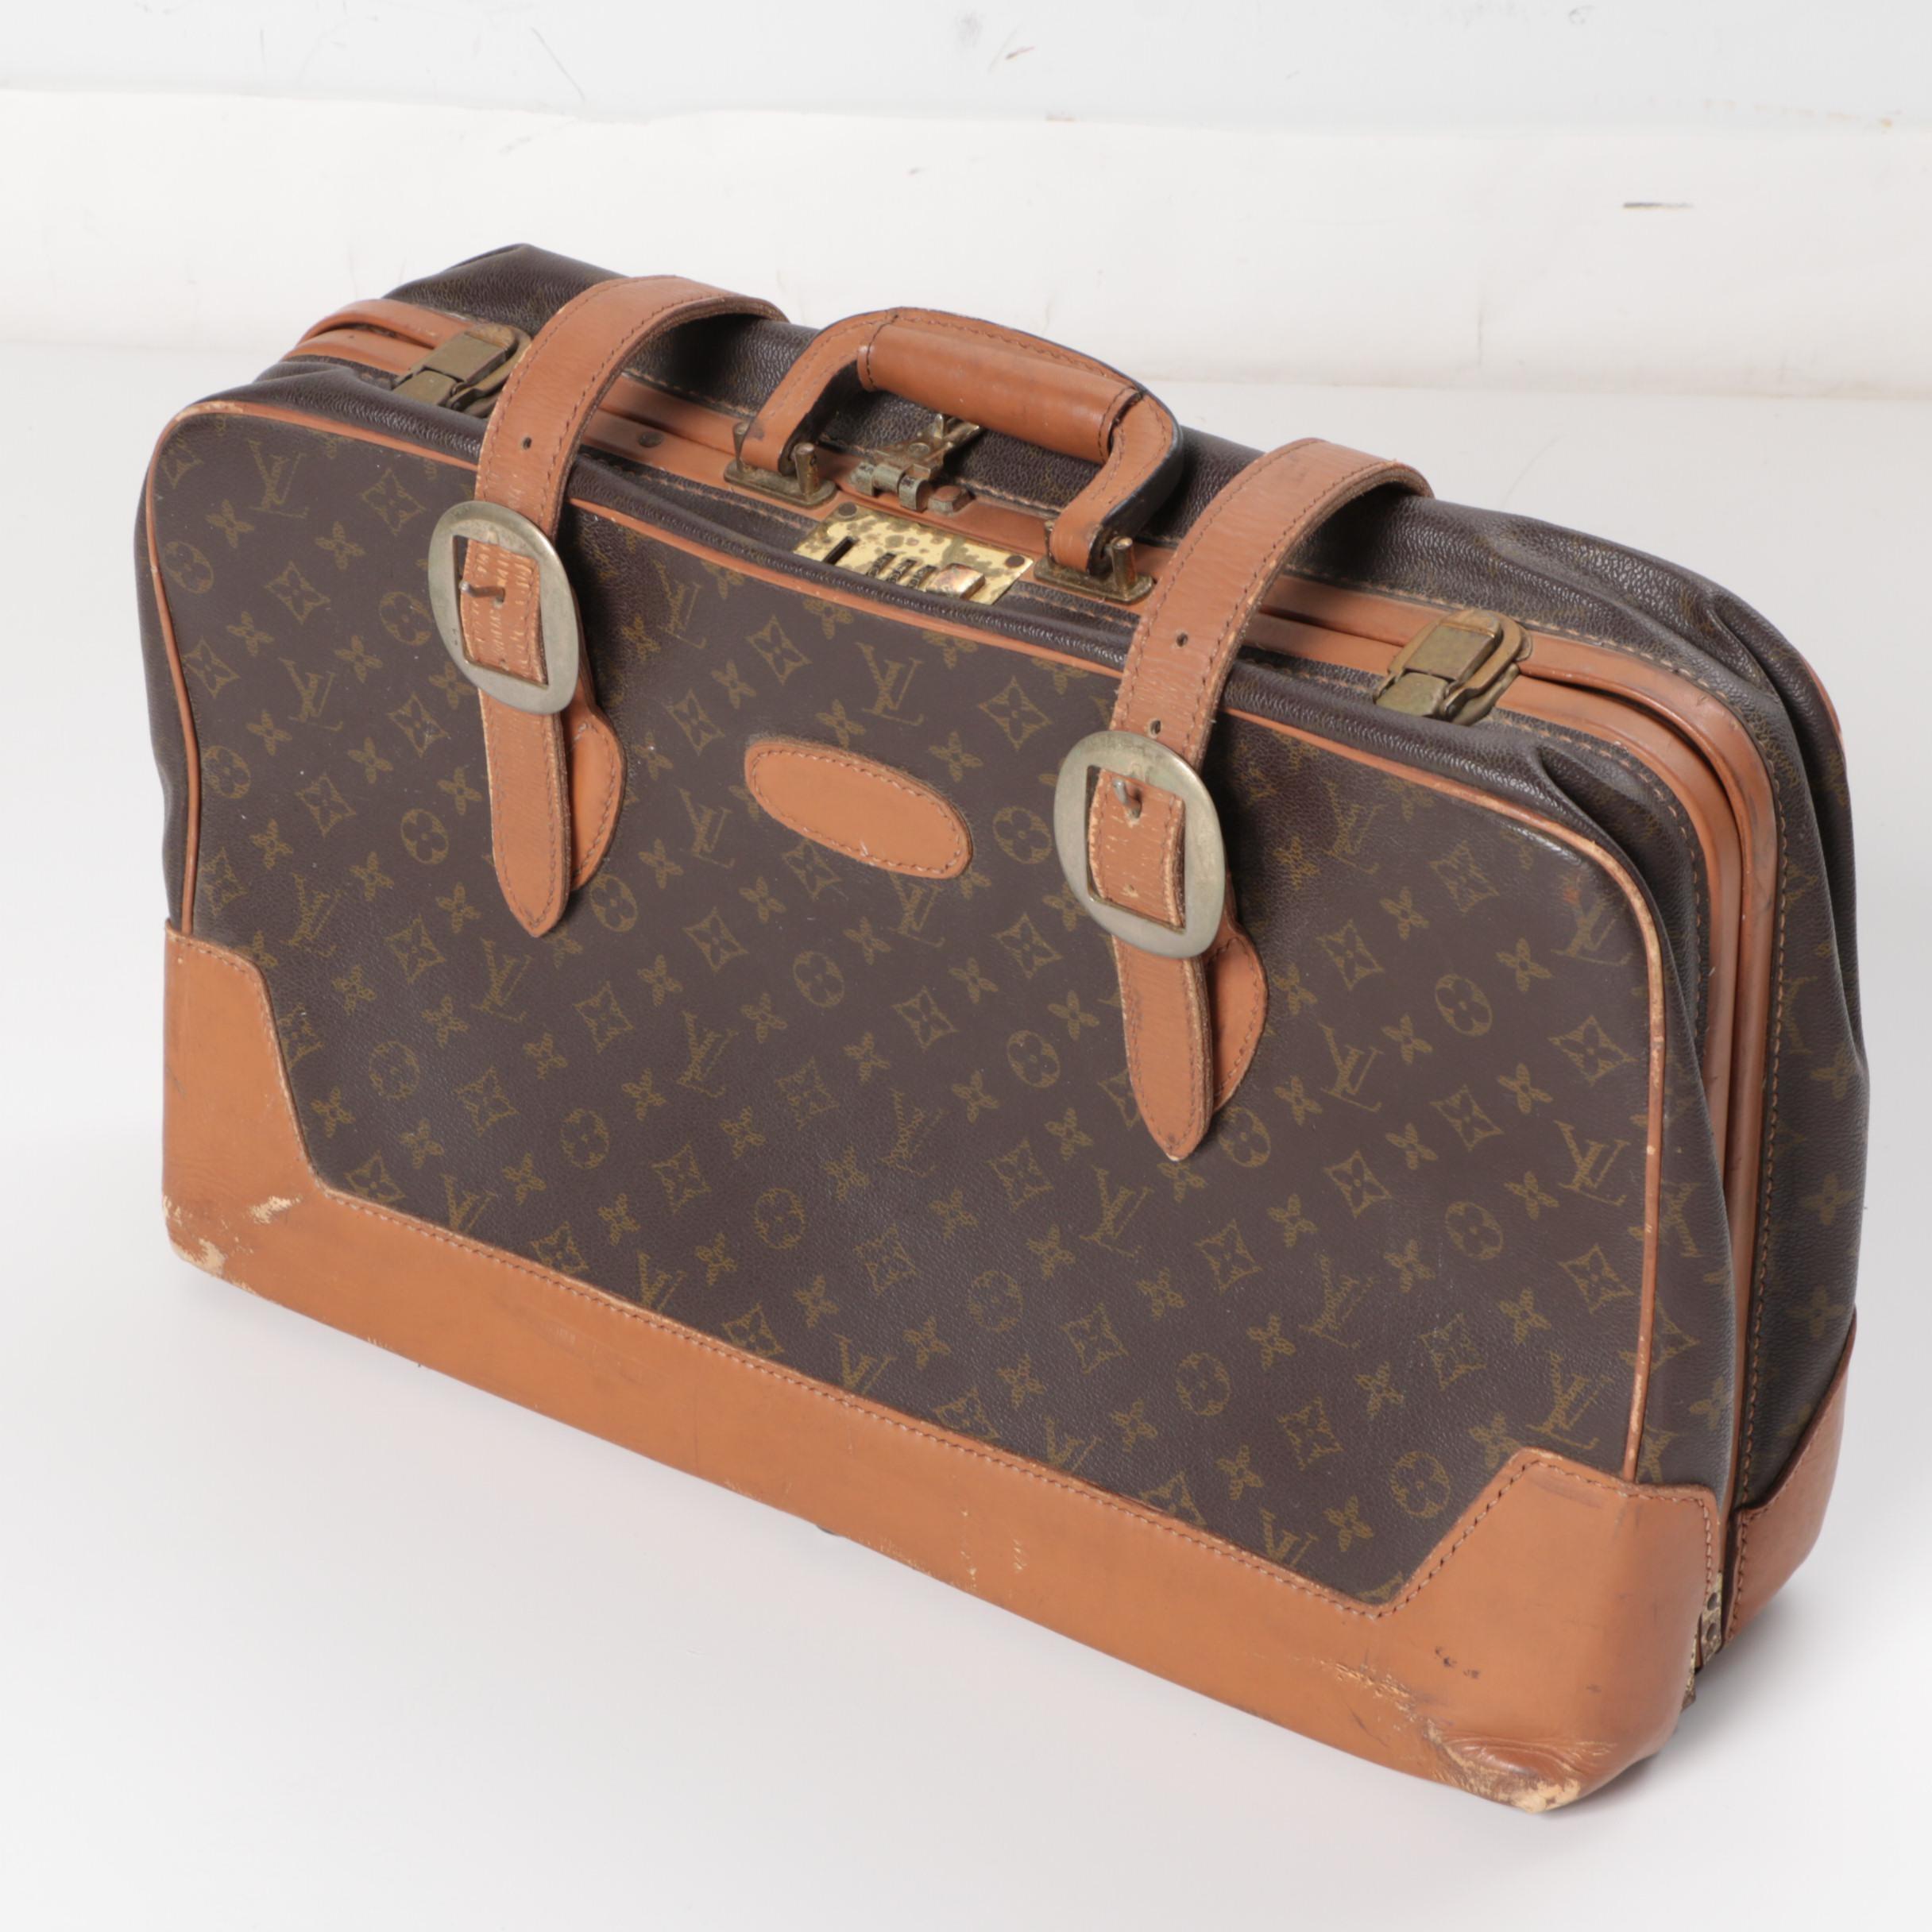 Vintage Louis Vuitton Monogram Overnight Bag